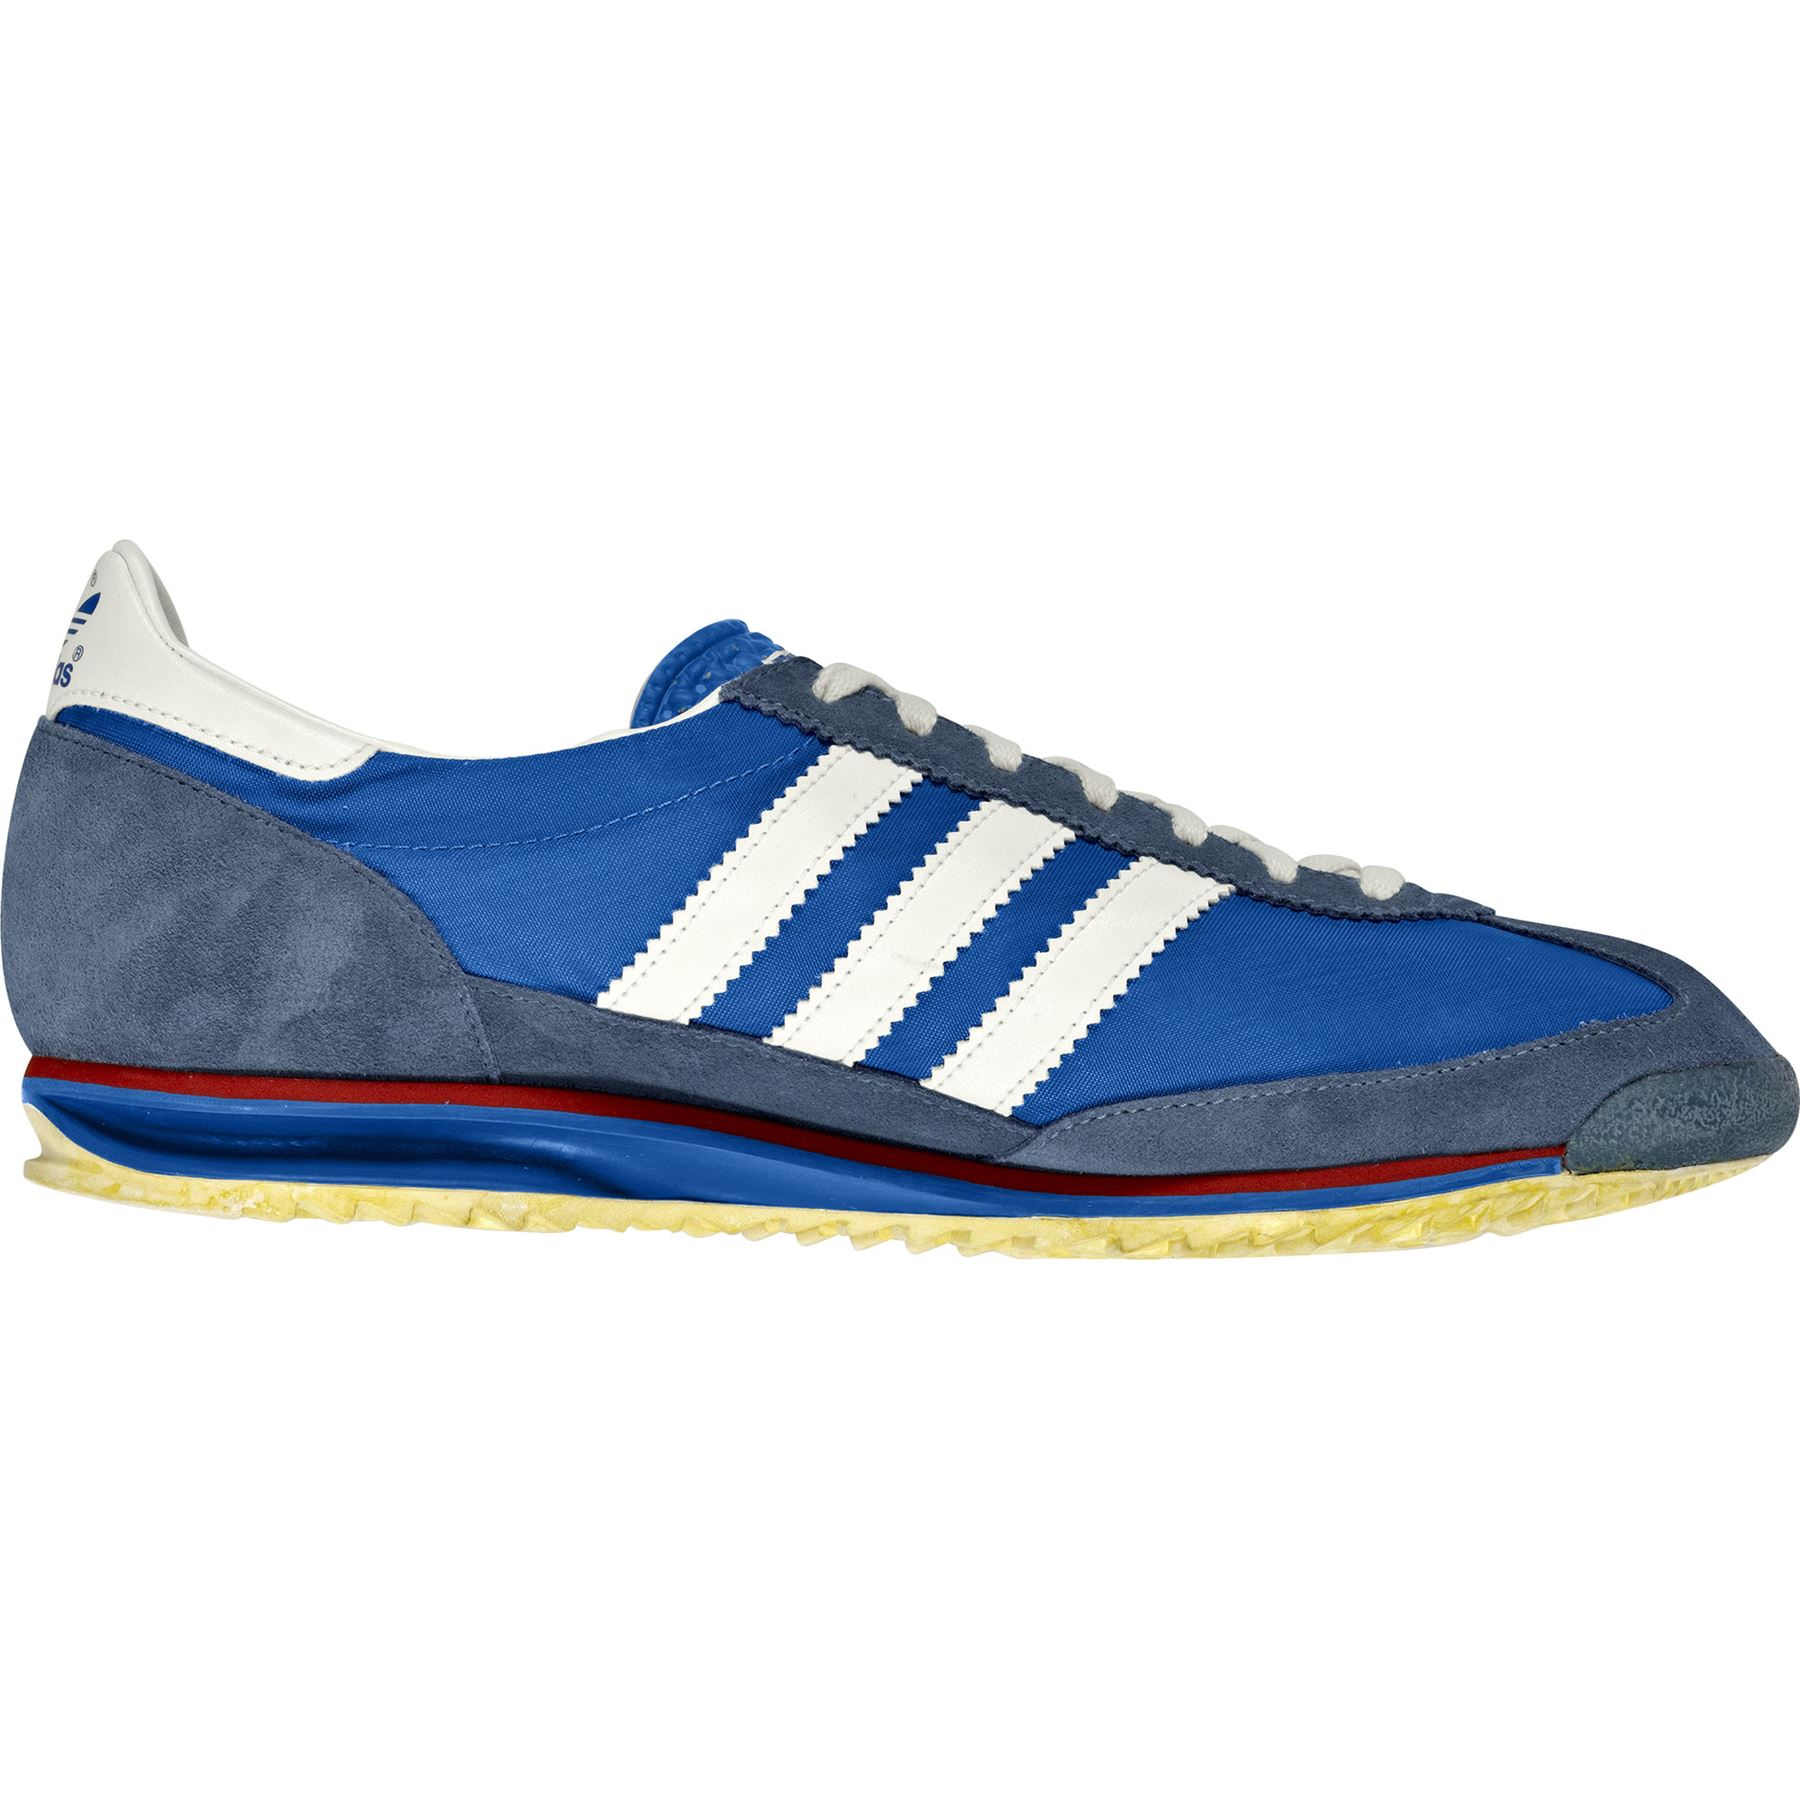 c5050a48d1e5 adidas Originals SL 72 Vintage Trainers Mens Blue Retro Sneakers Running  Shoes